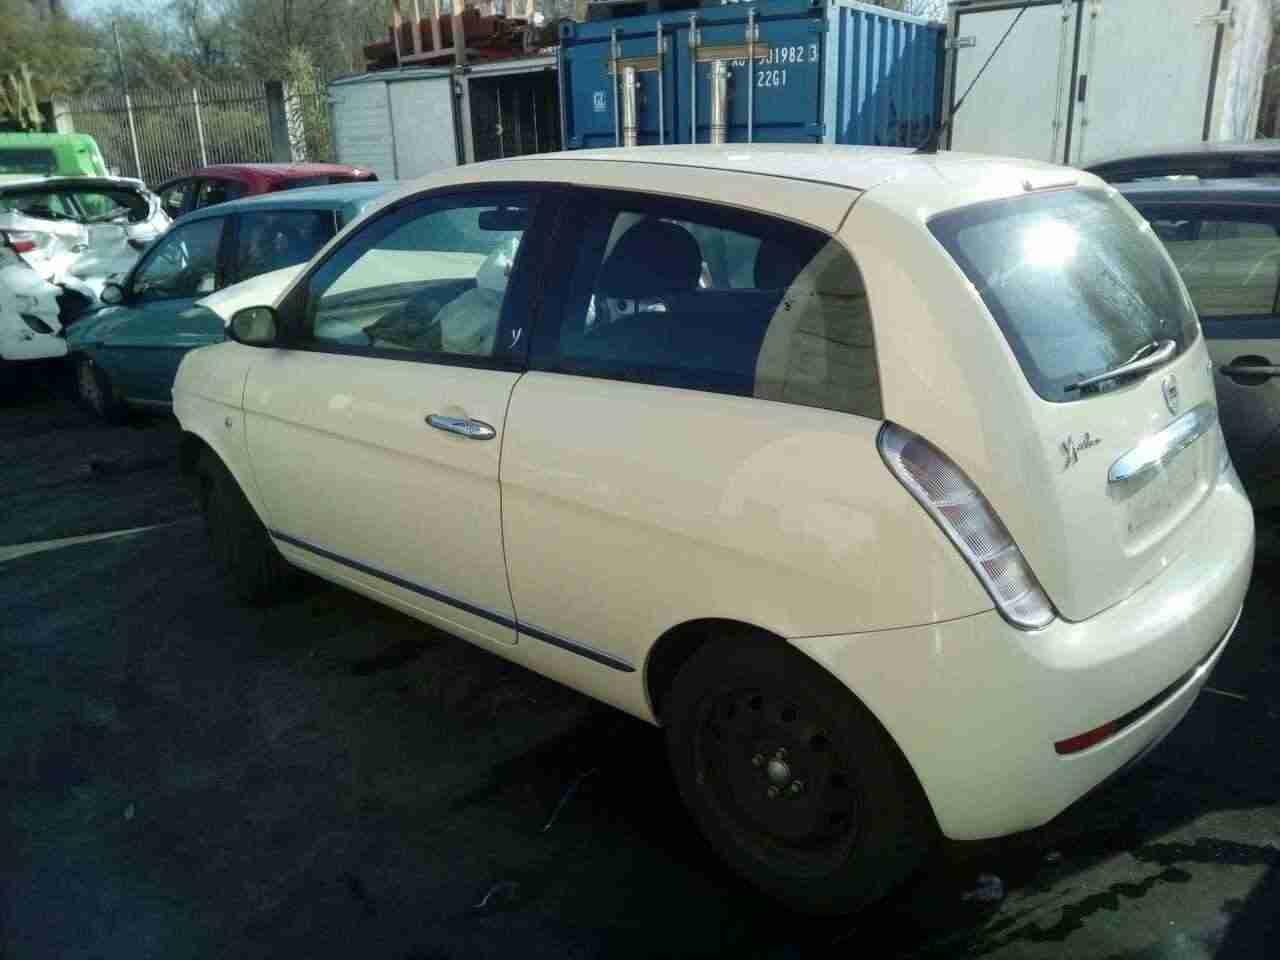 Pezzi per Lancia Ypsilon 1300 multijet 09 199A3000